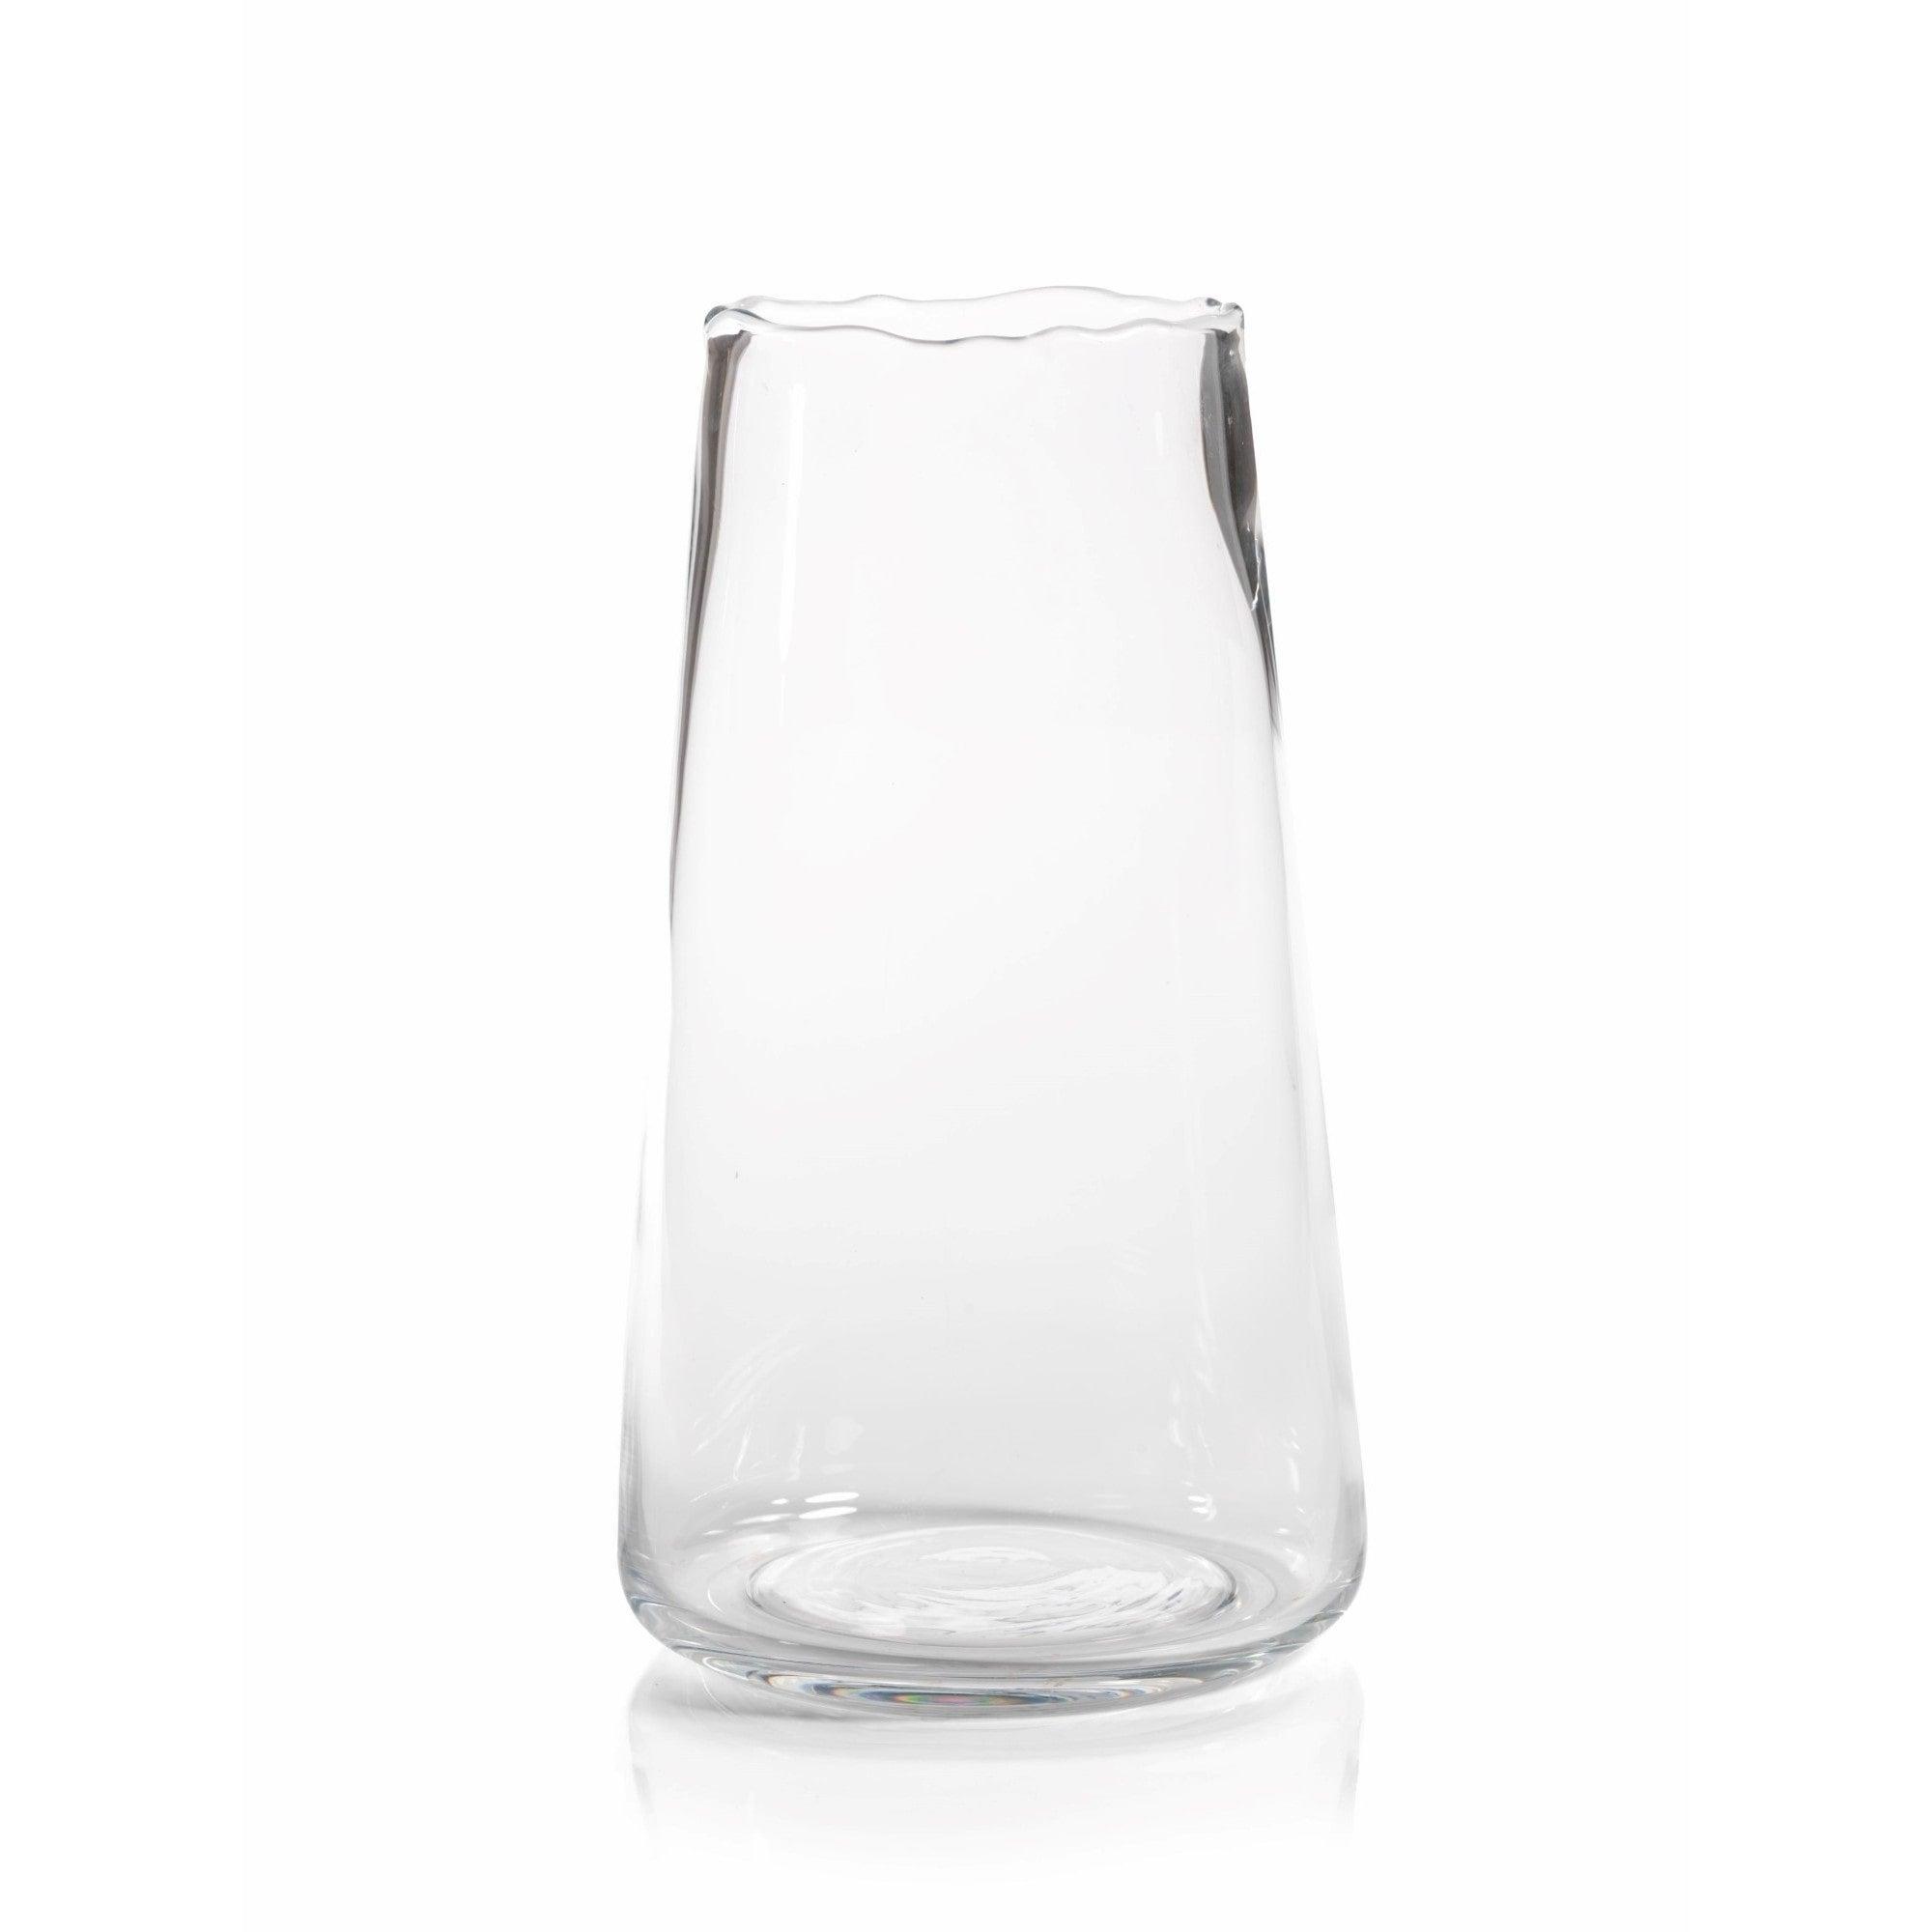 lsa s tall glass flower vase international stem heal clear